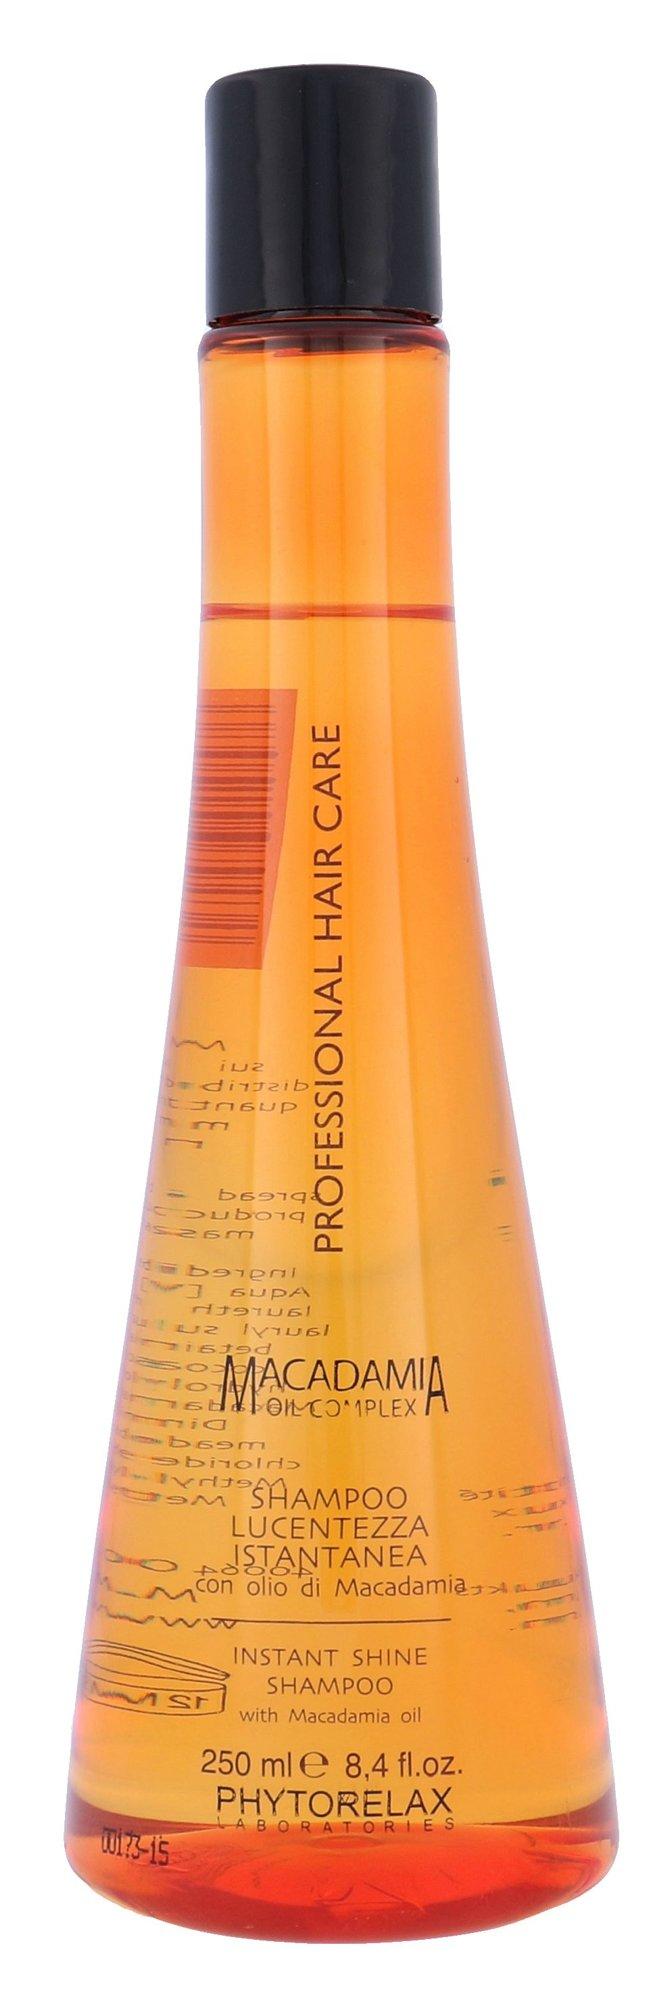 Phytorelax Laboratories Macadamia Instant Shine Shampoo Cosmetic 250ml